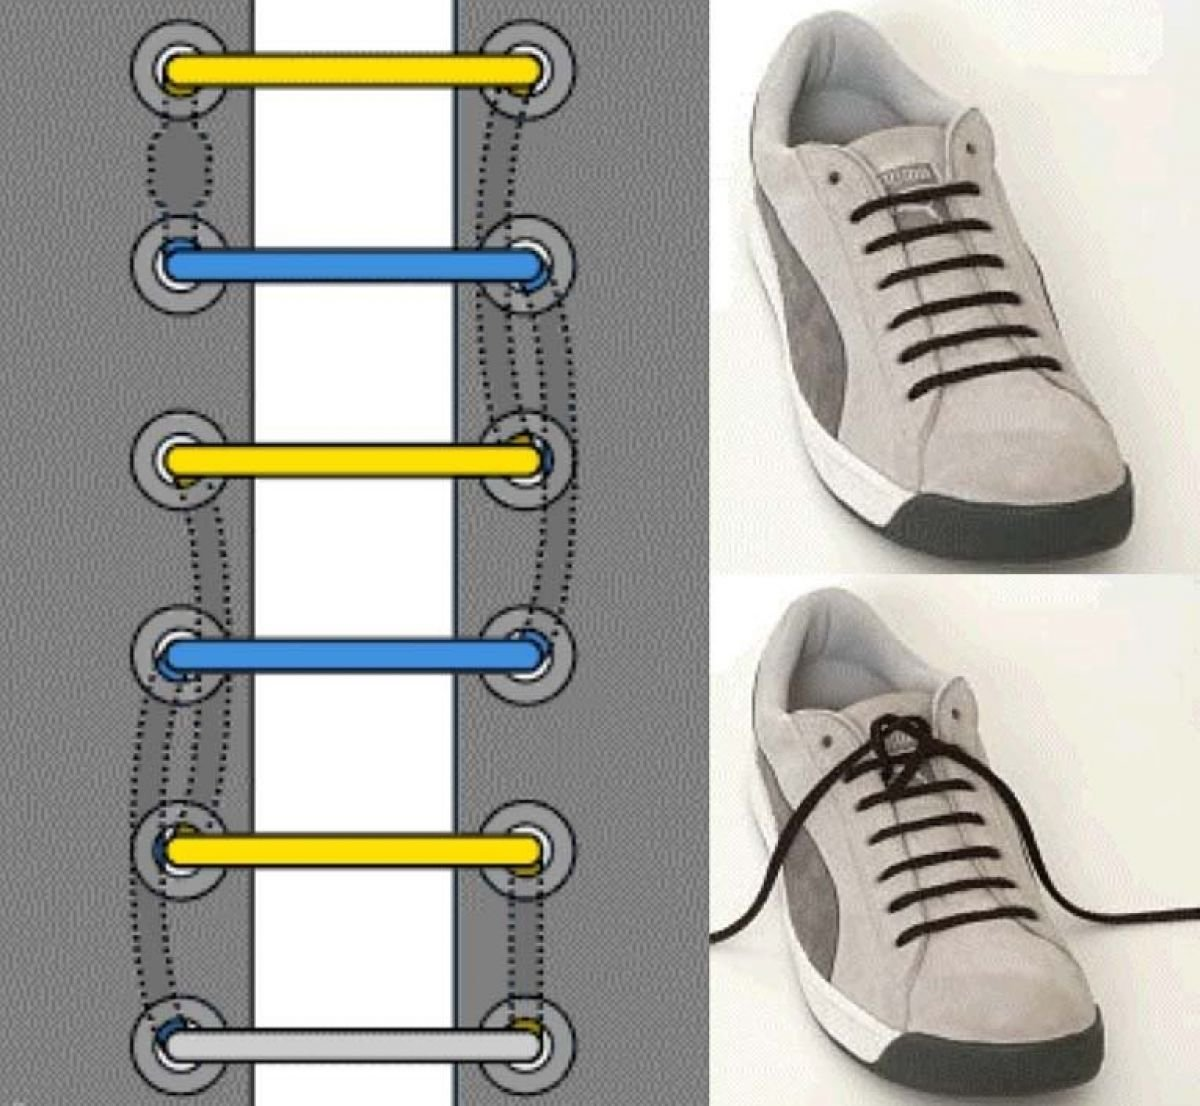 вспышка картинки как завязывать шнурки кеды списал